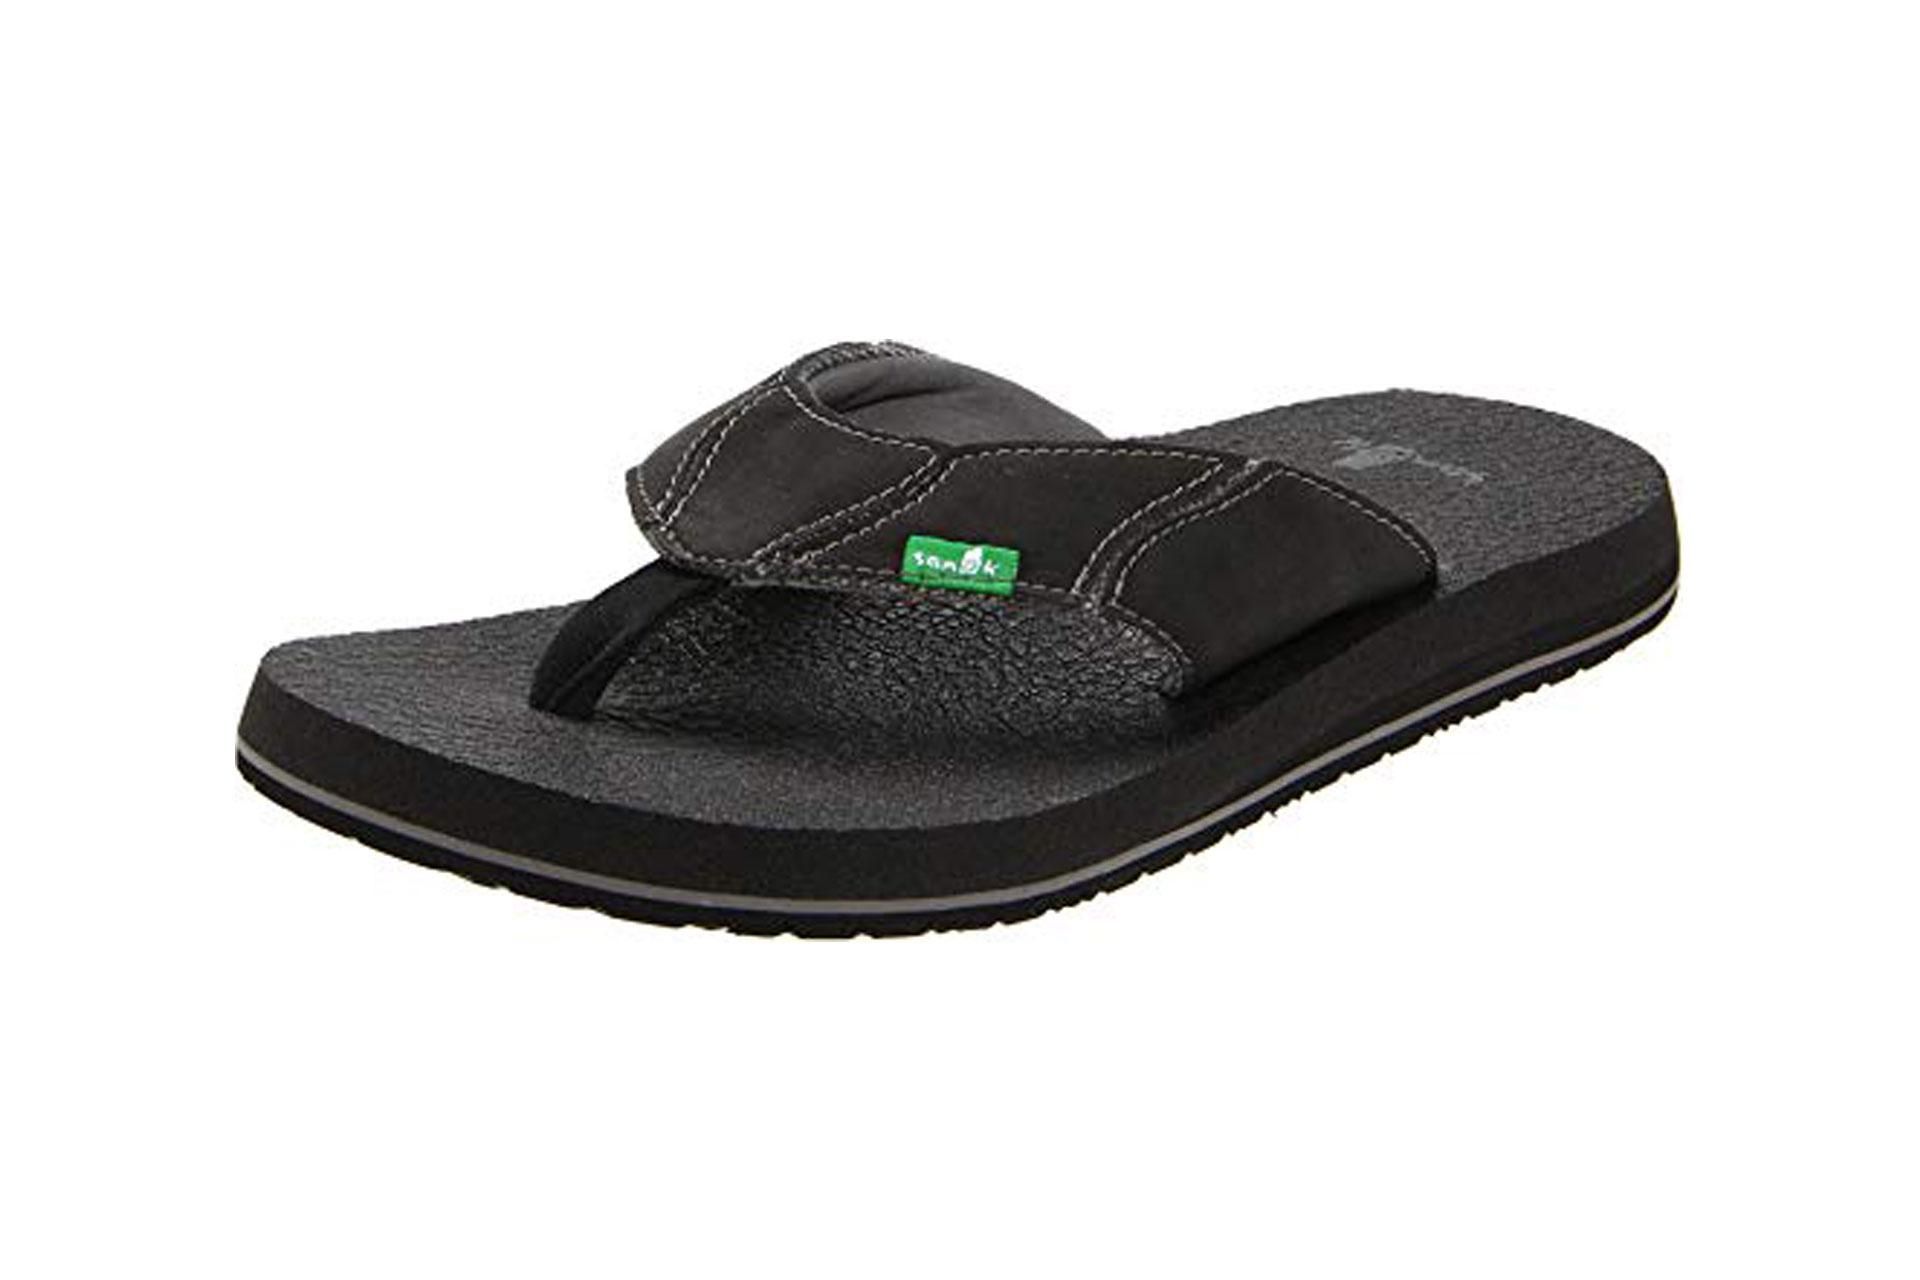 Sanuk Mens Flip Flops; Courtesy of Amazon